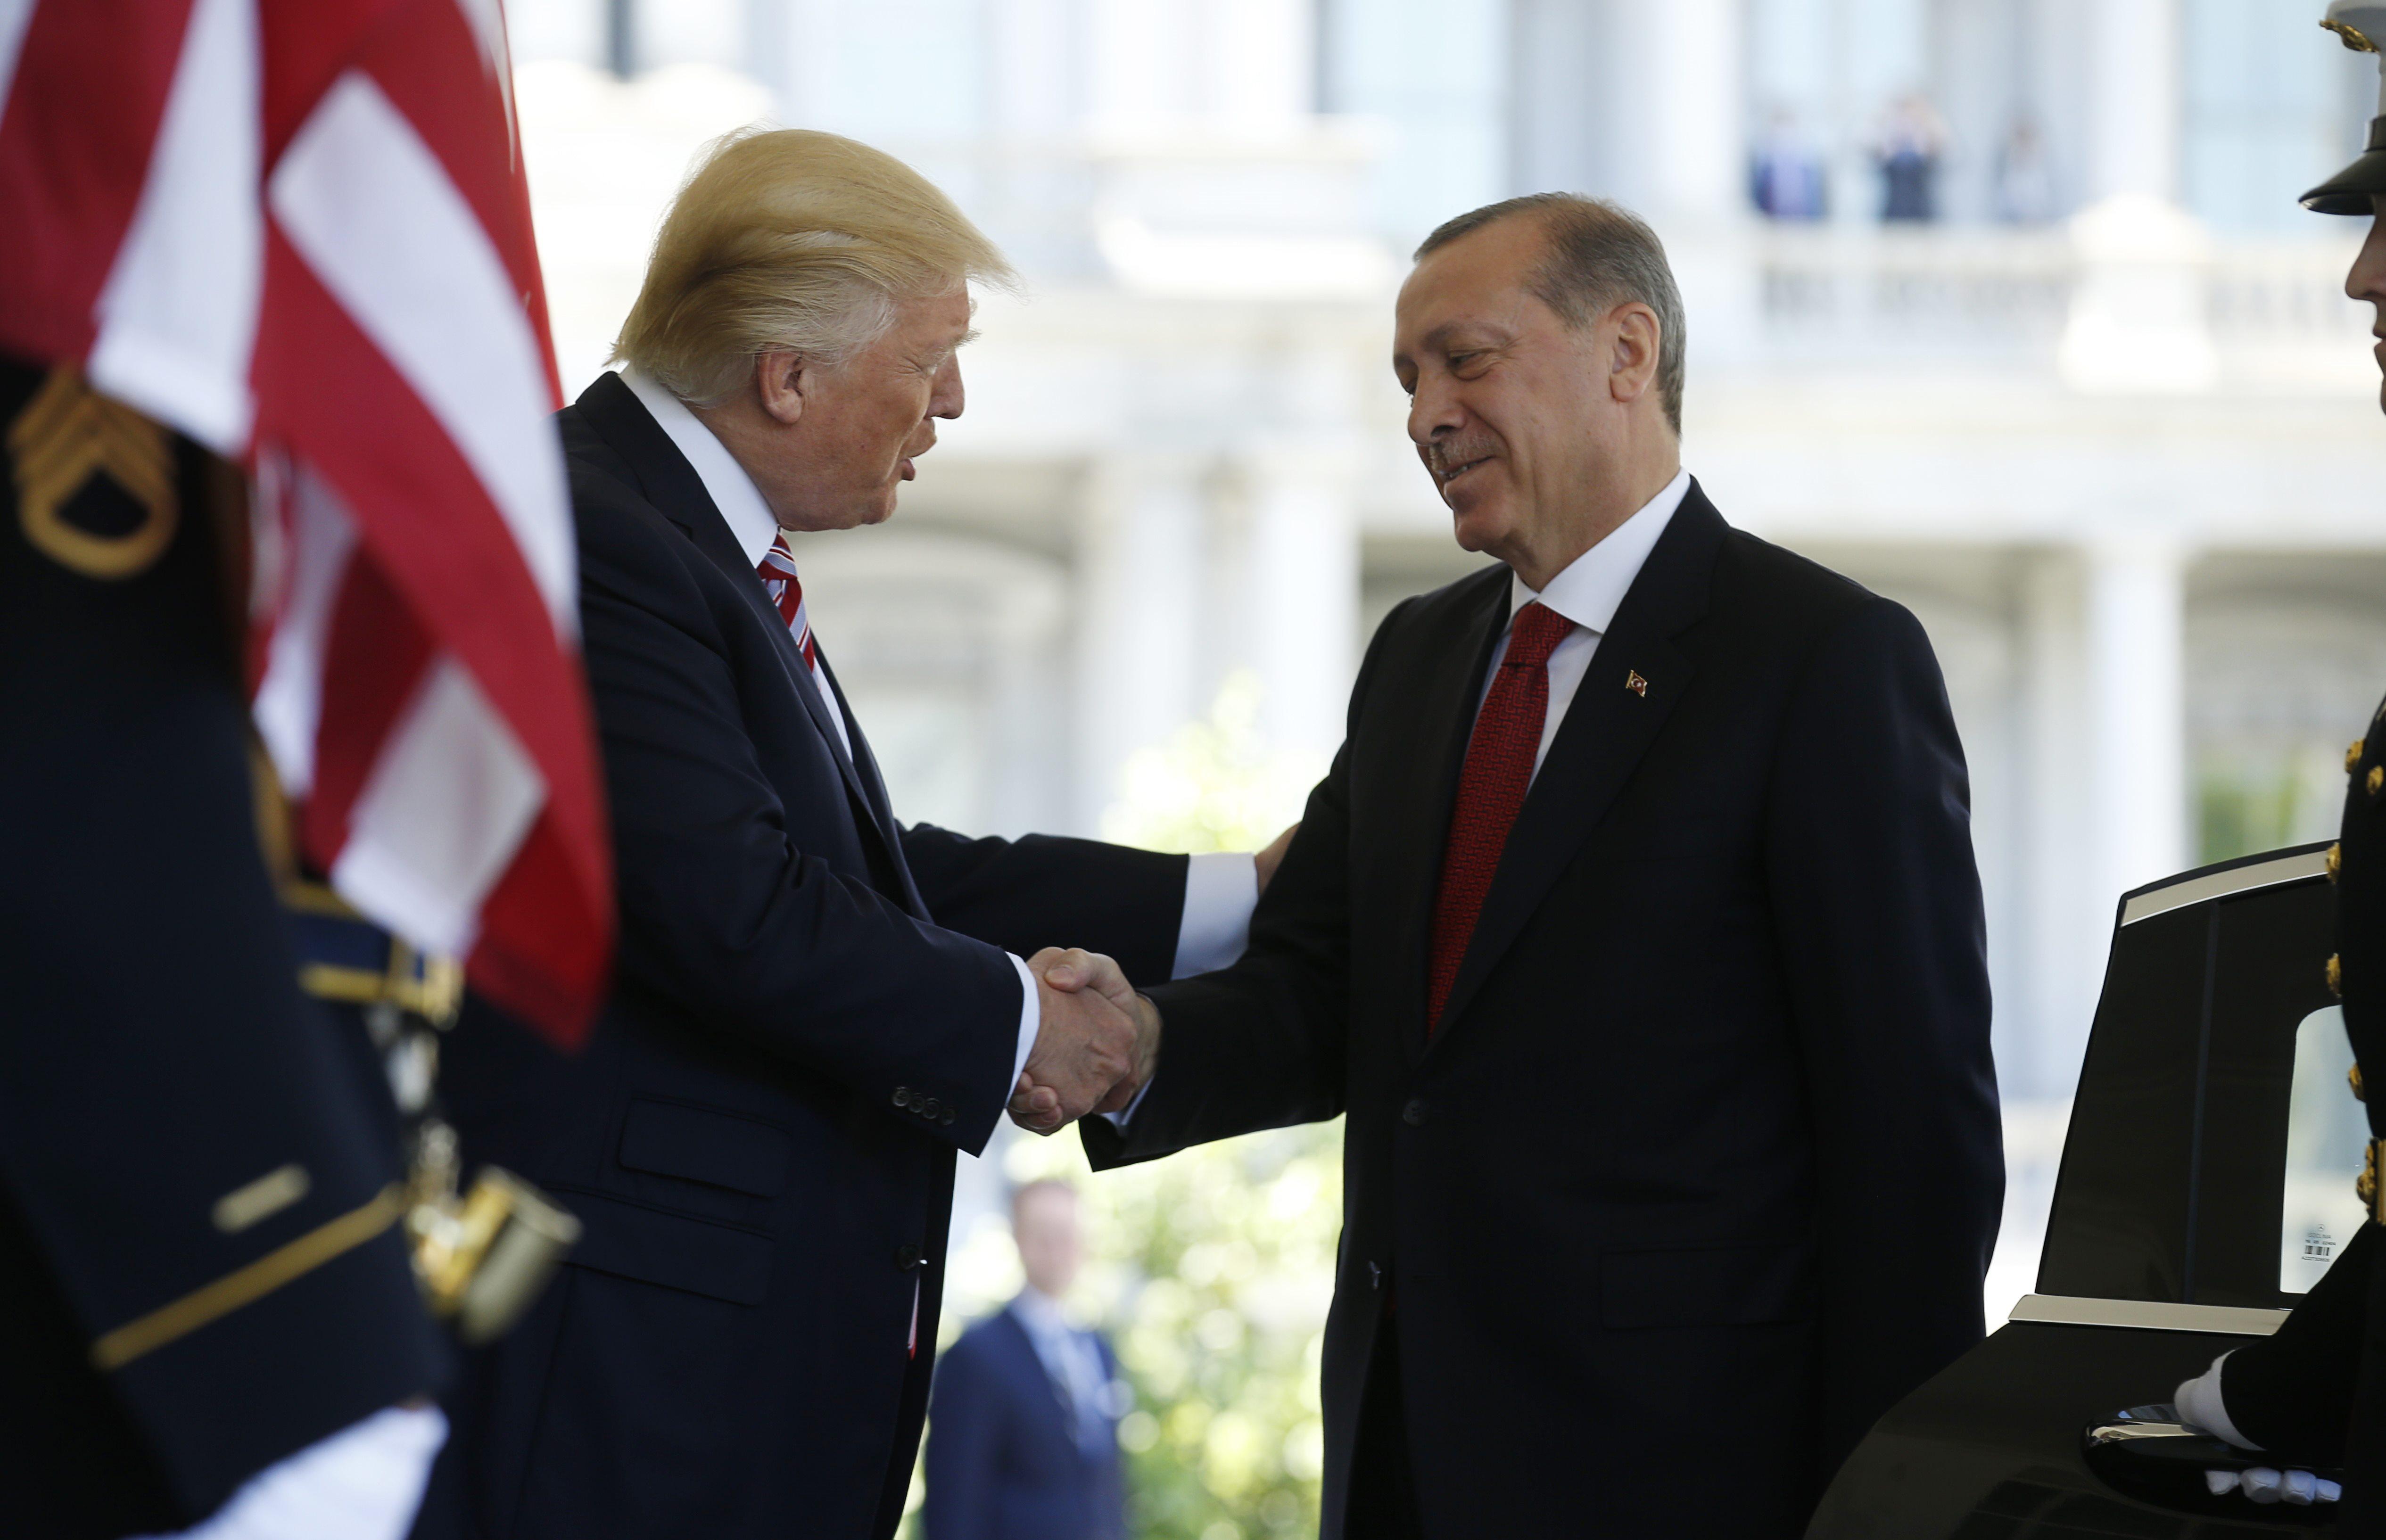 2017 05 16T165345Z 2014106237 HP1ED5G1AXKBB RTRMADP 3 USA TURKEY